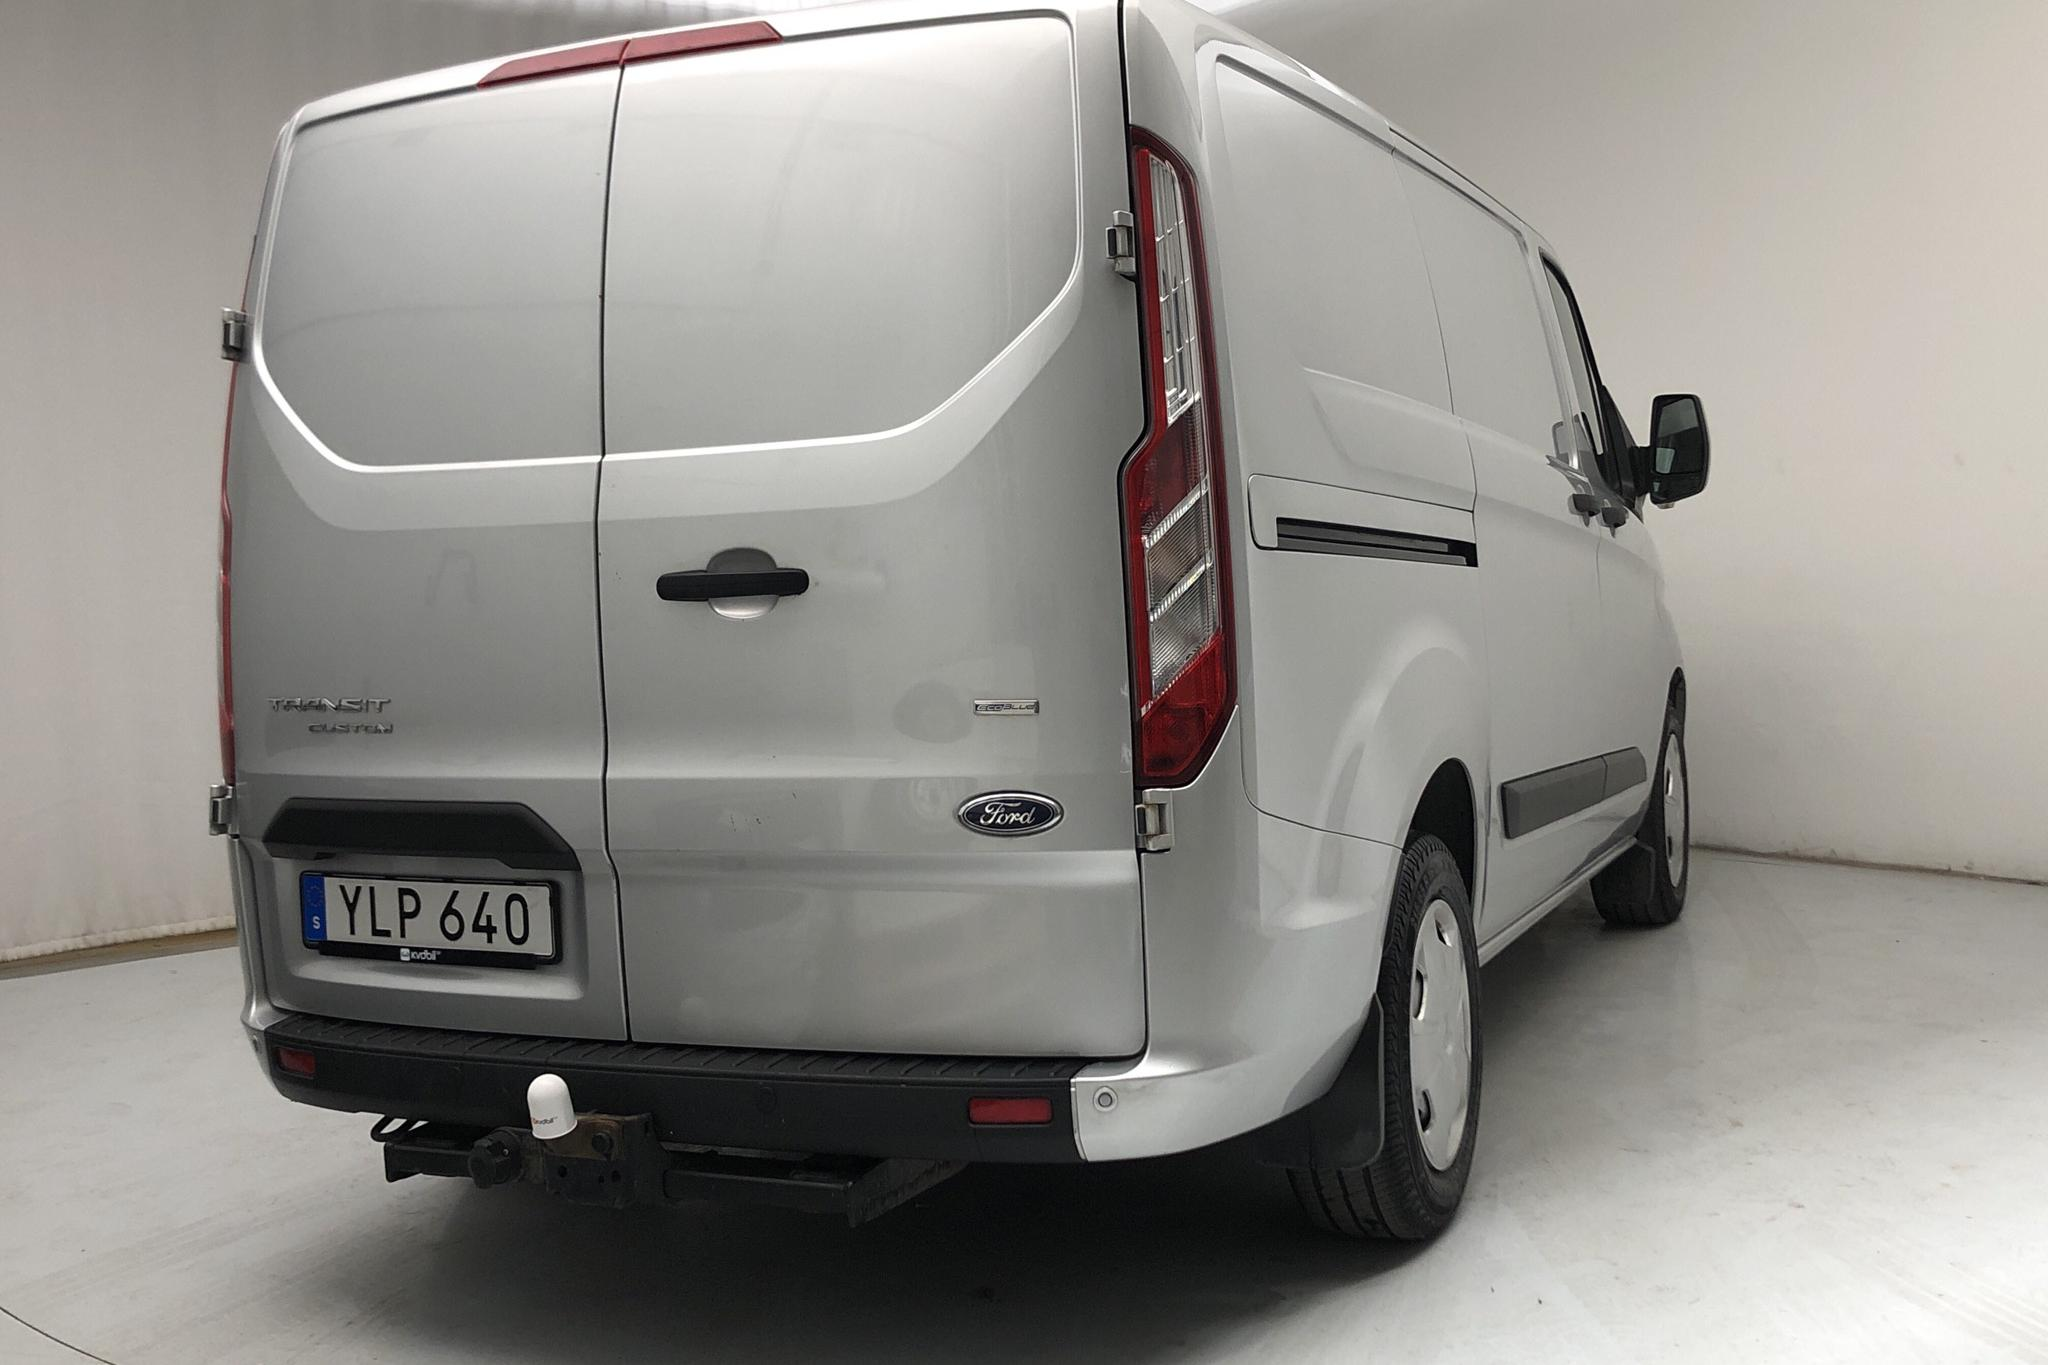 Ford Transit Custom 280 (130hk) - 61 510 km - Automatic - gray - 2018